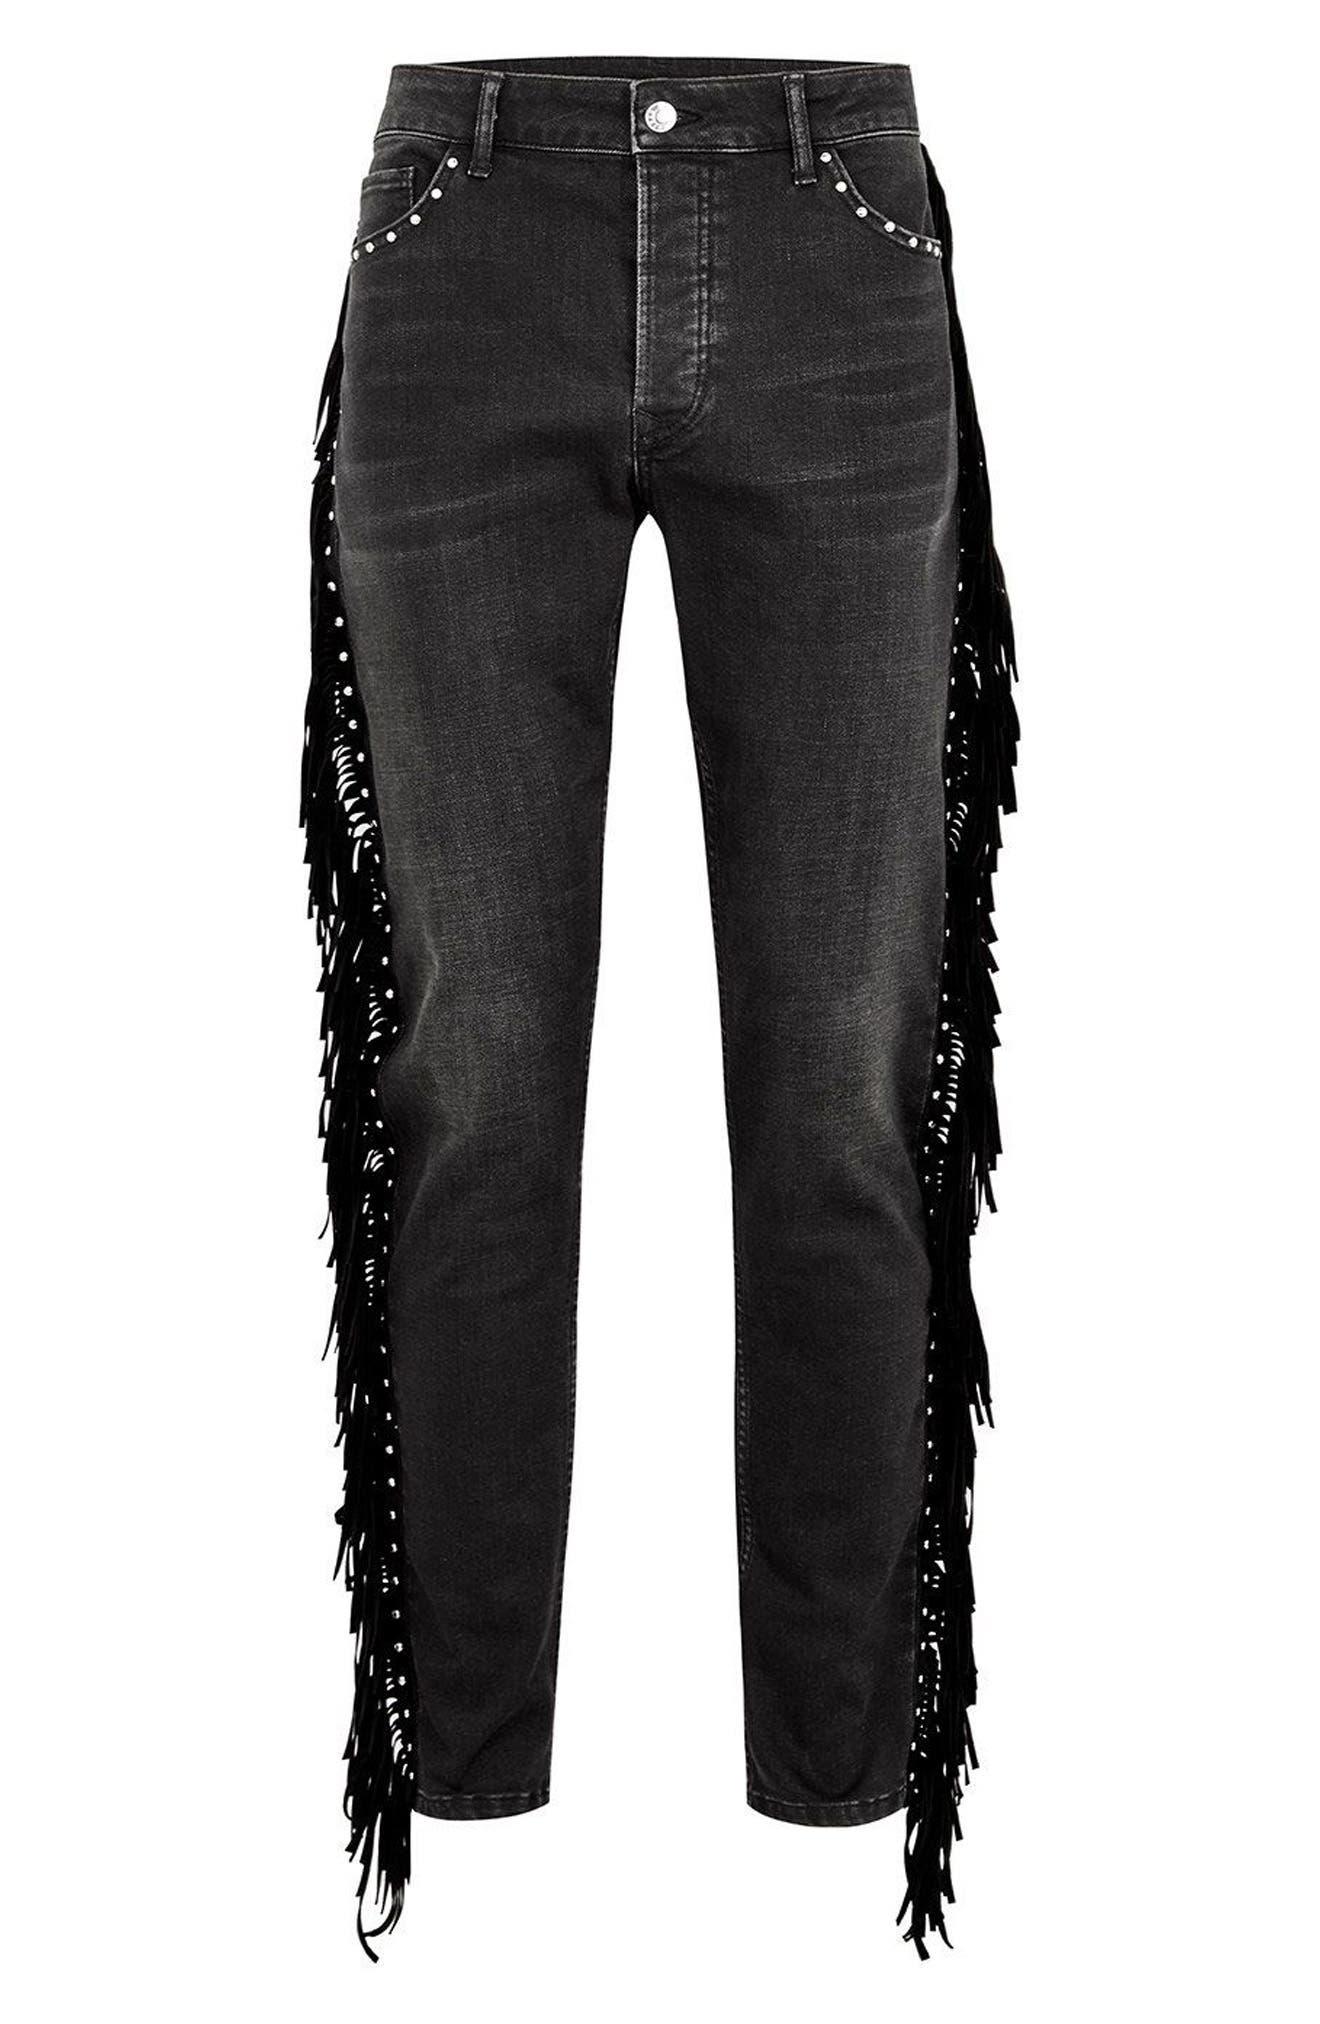 Studded Fringe Skinny Fit Jeans,                             Alternate thumbnail 3, color,                             Black